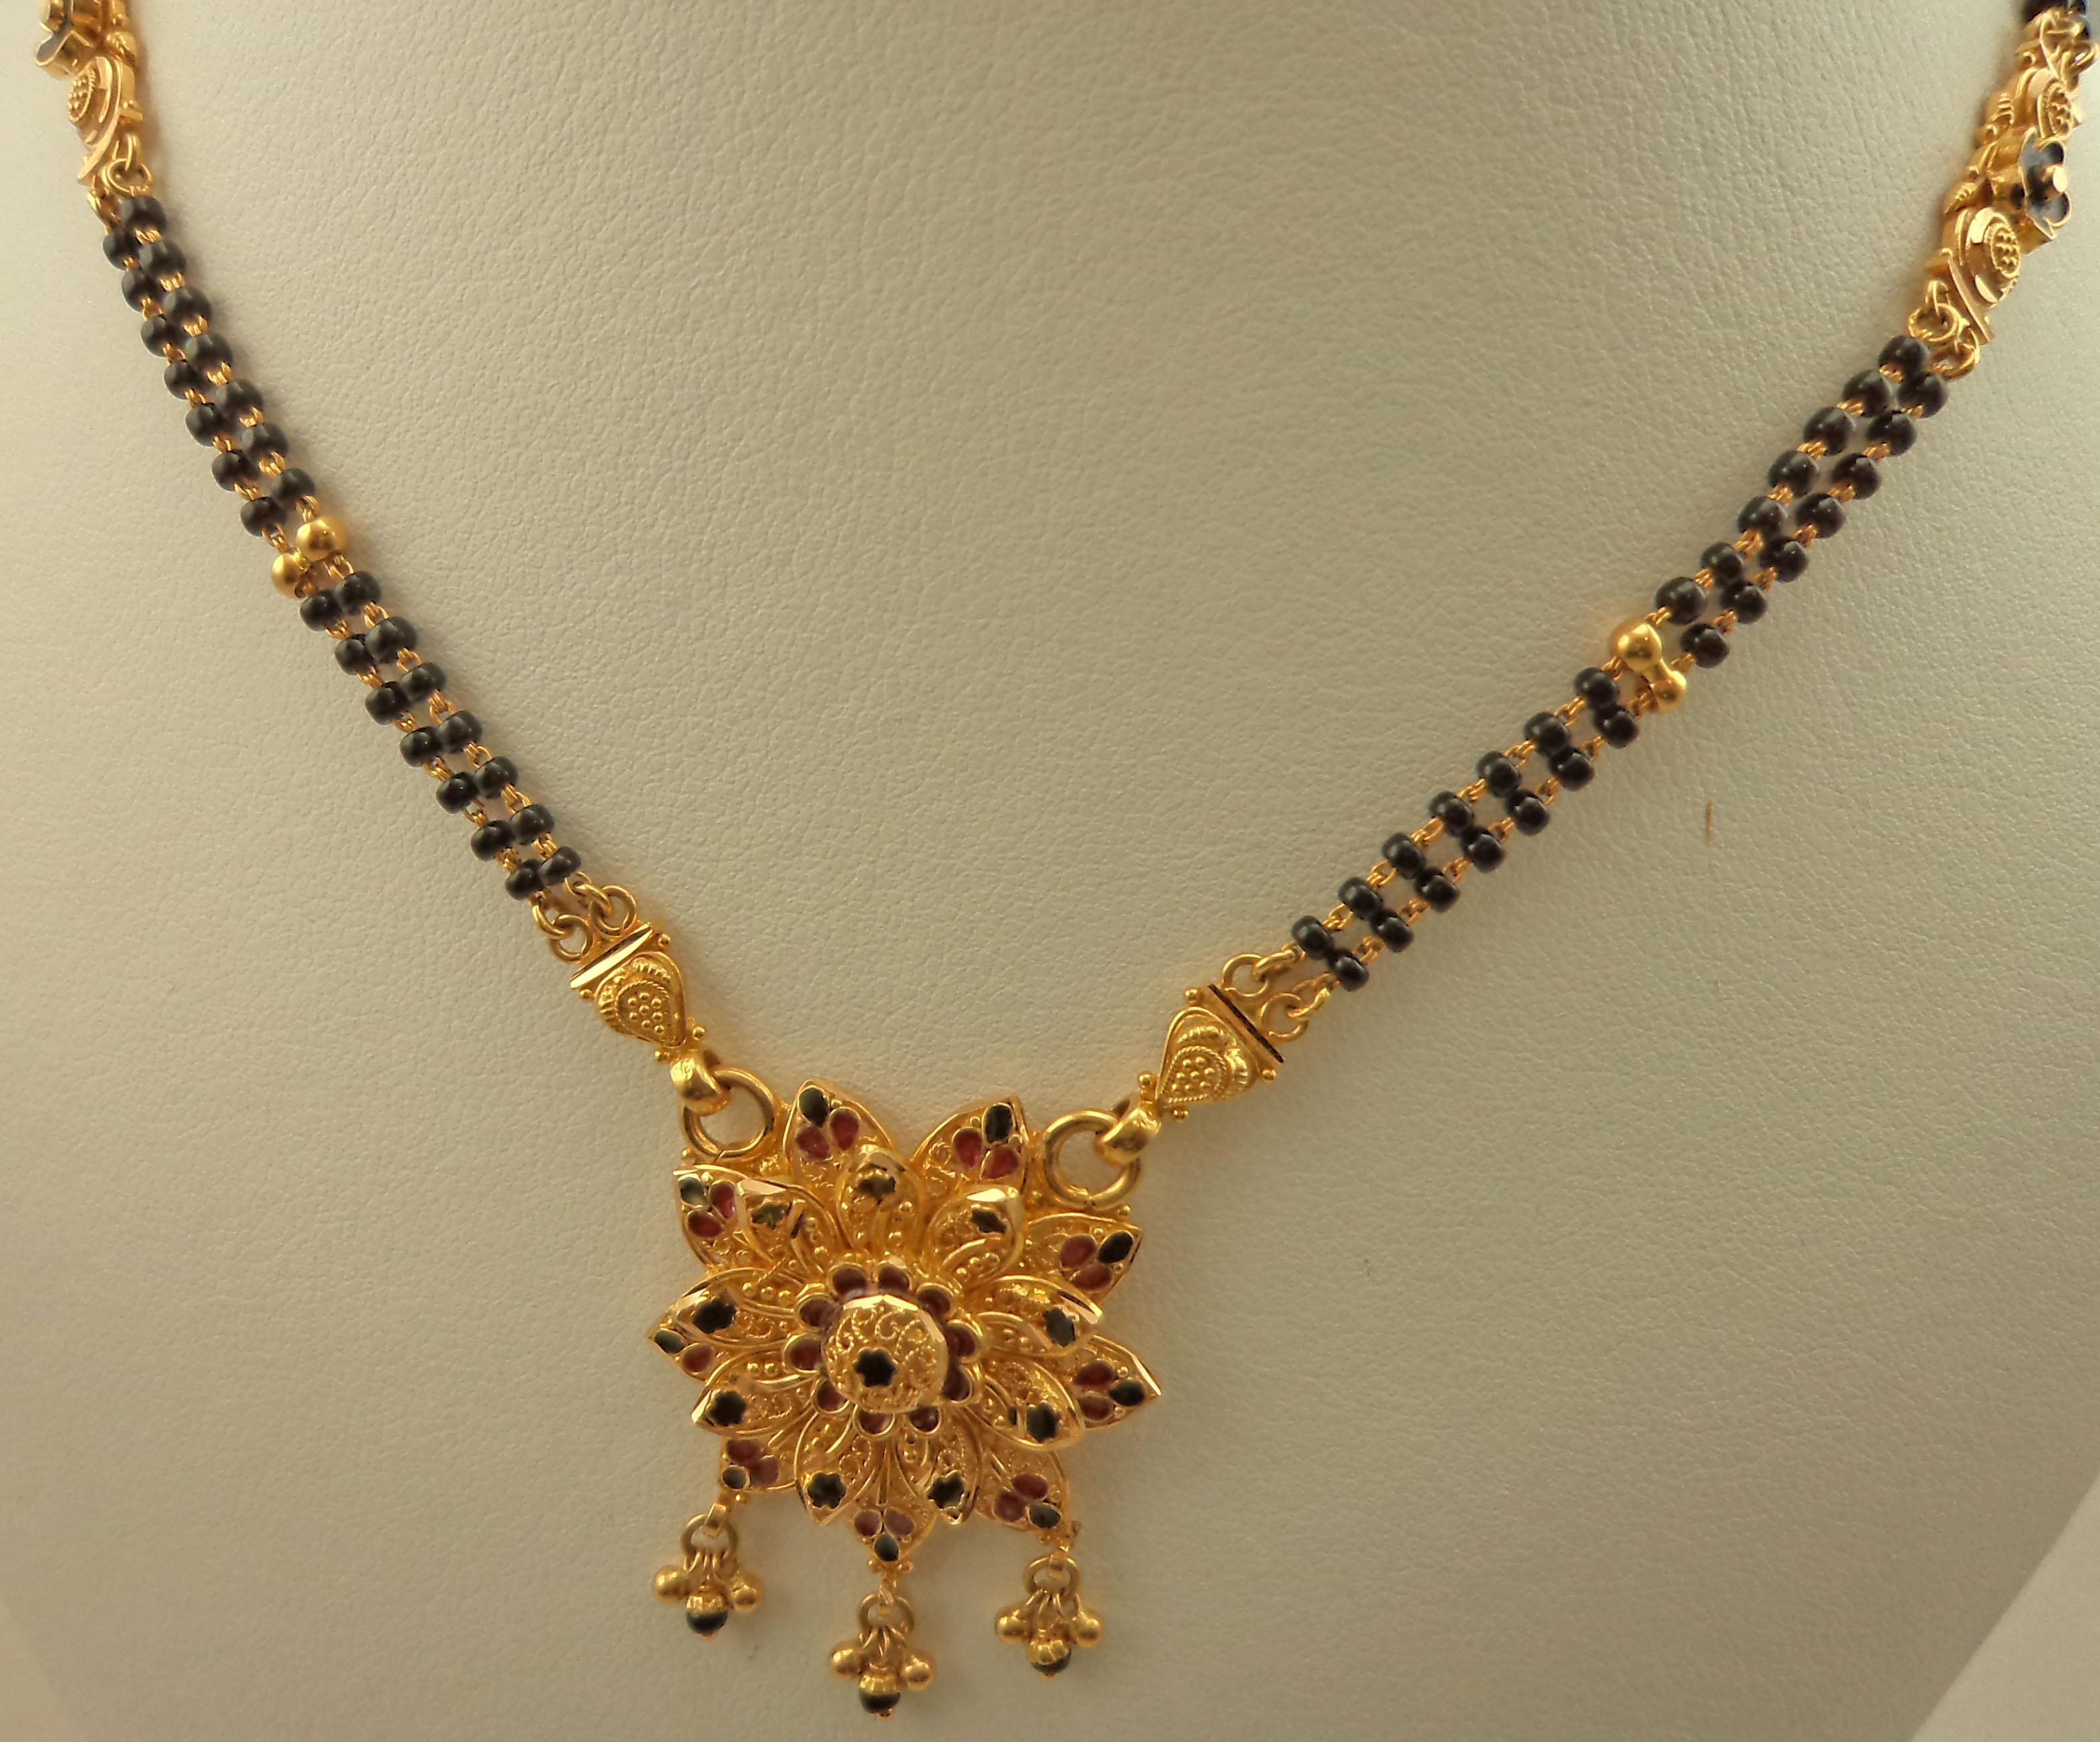 22 Karat Gold 2 Row Mangalsutra with Antique Meenakari